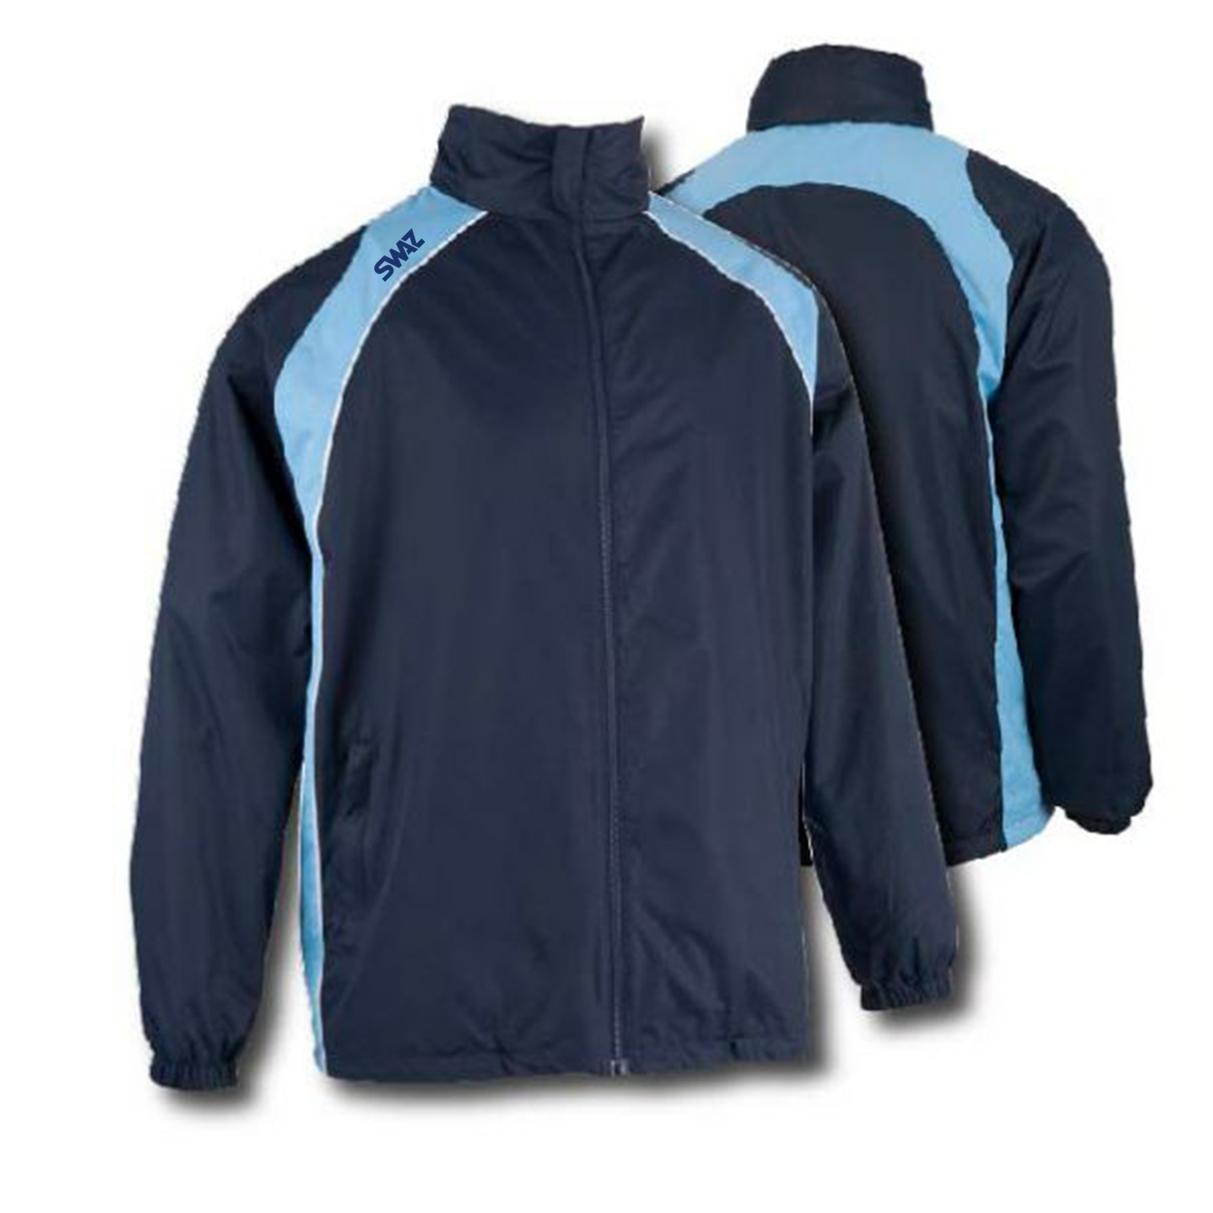 15 SWAZ Showerproof Jackets – Navy/Sky